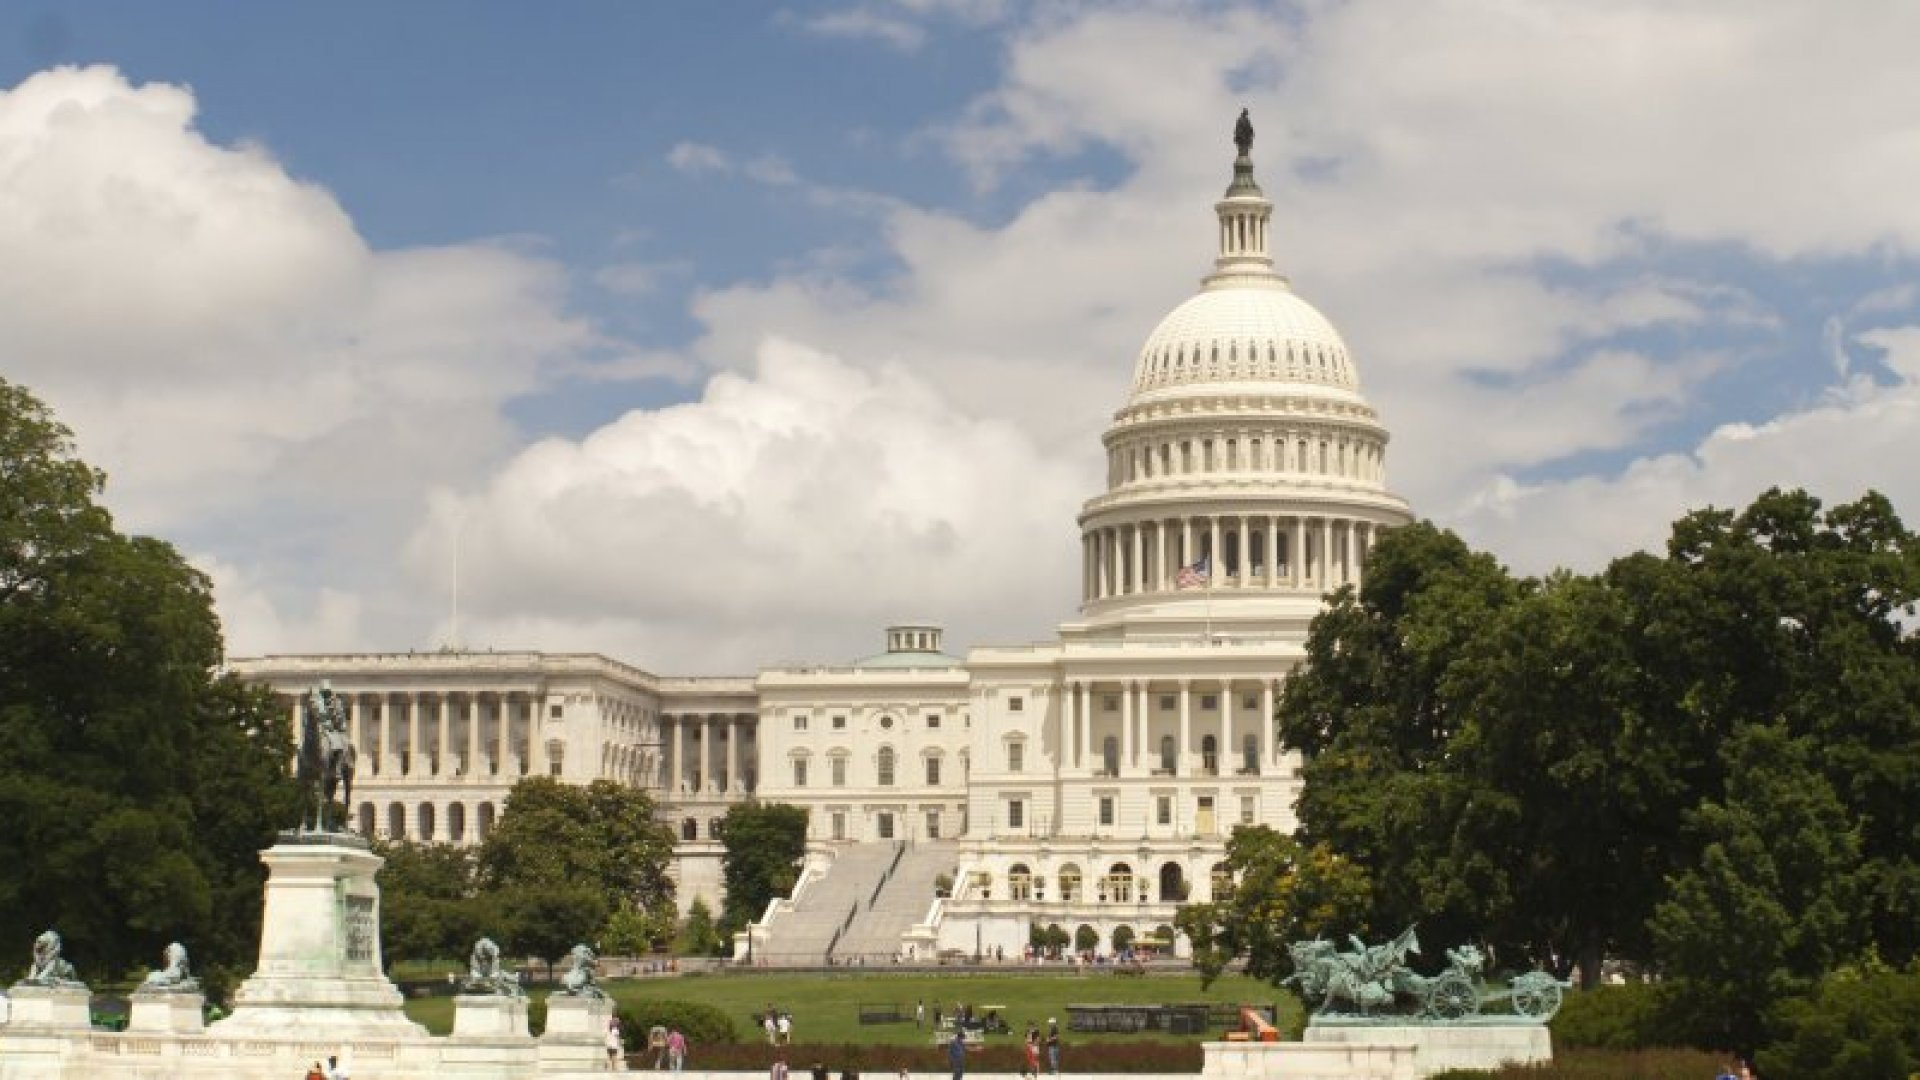 Massive $1.1 Trillion Spending Bill Unveiled